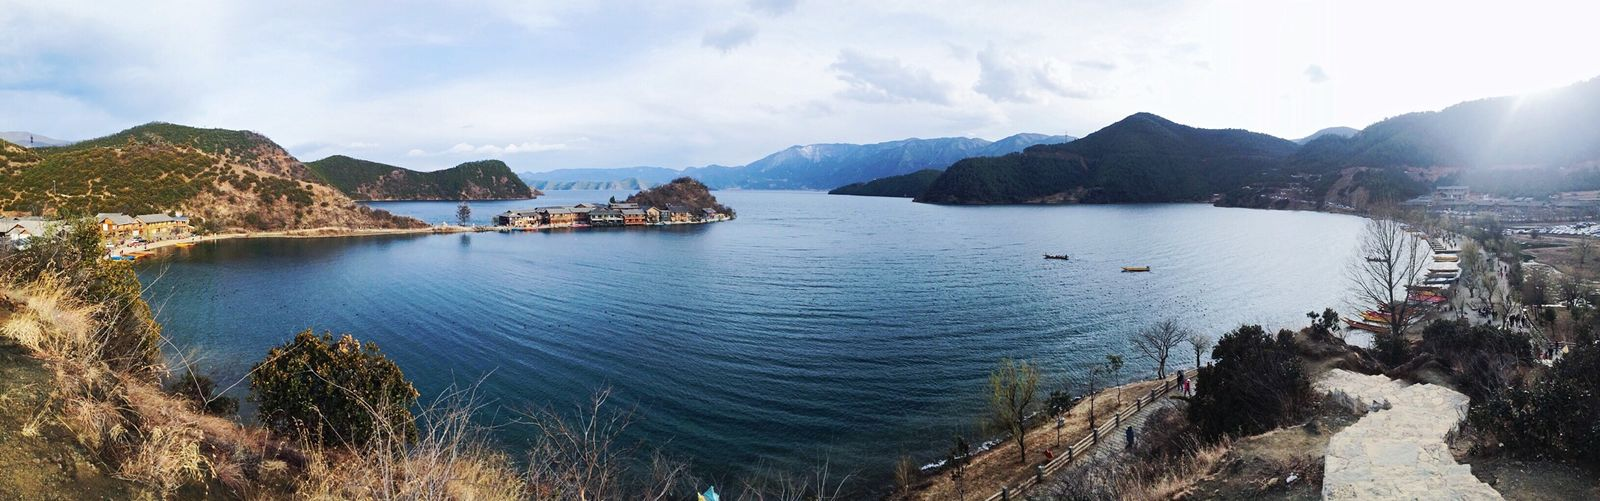 Holiday Relaxing lake First Eyeem Photo